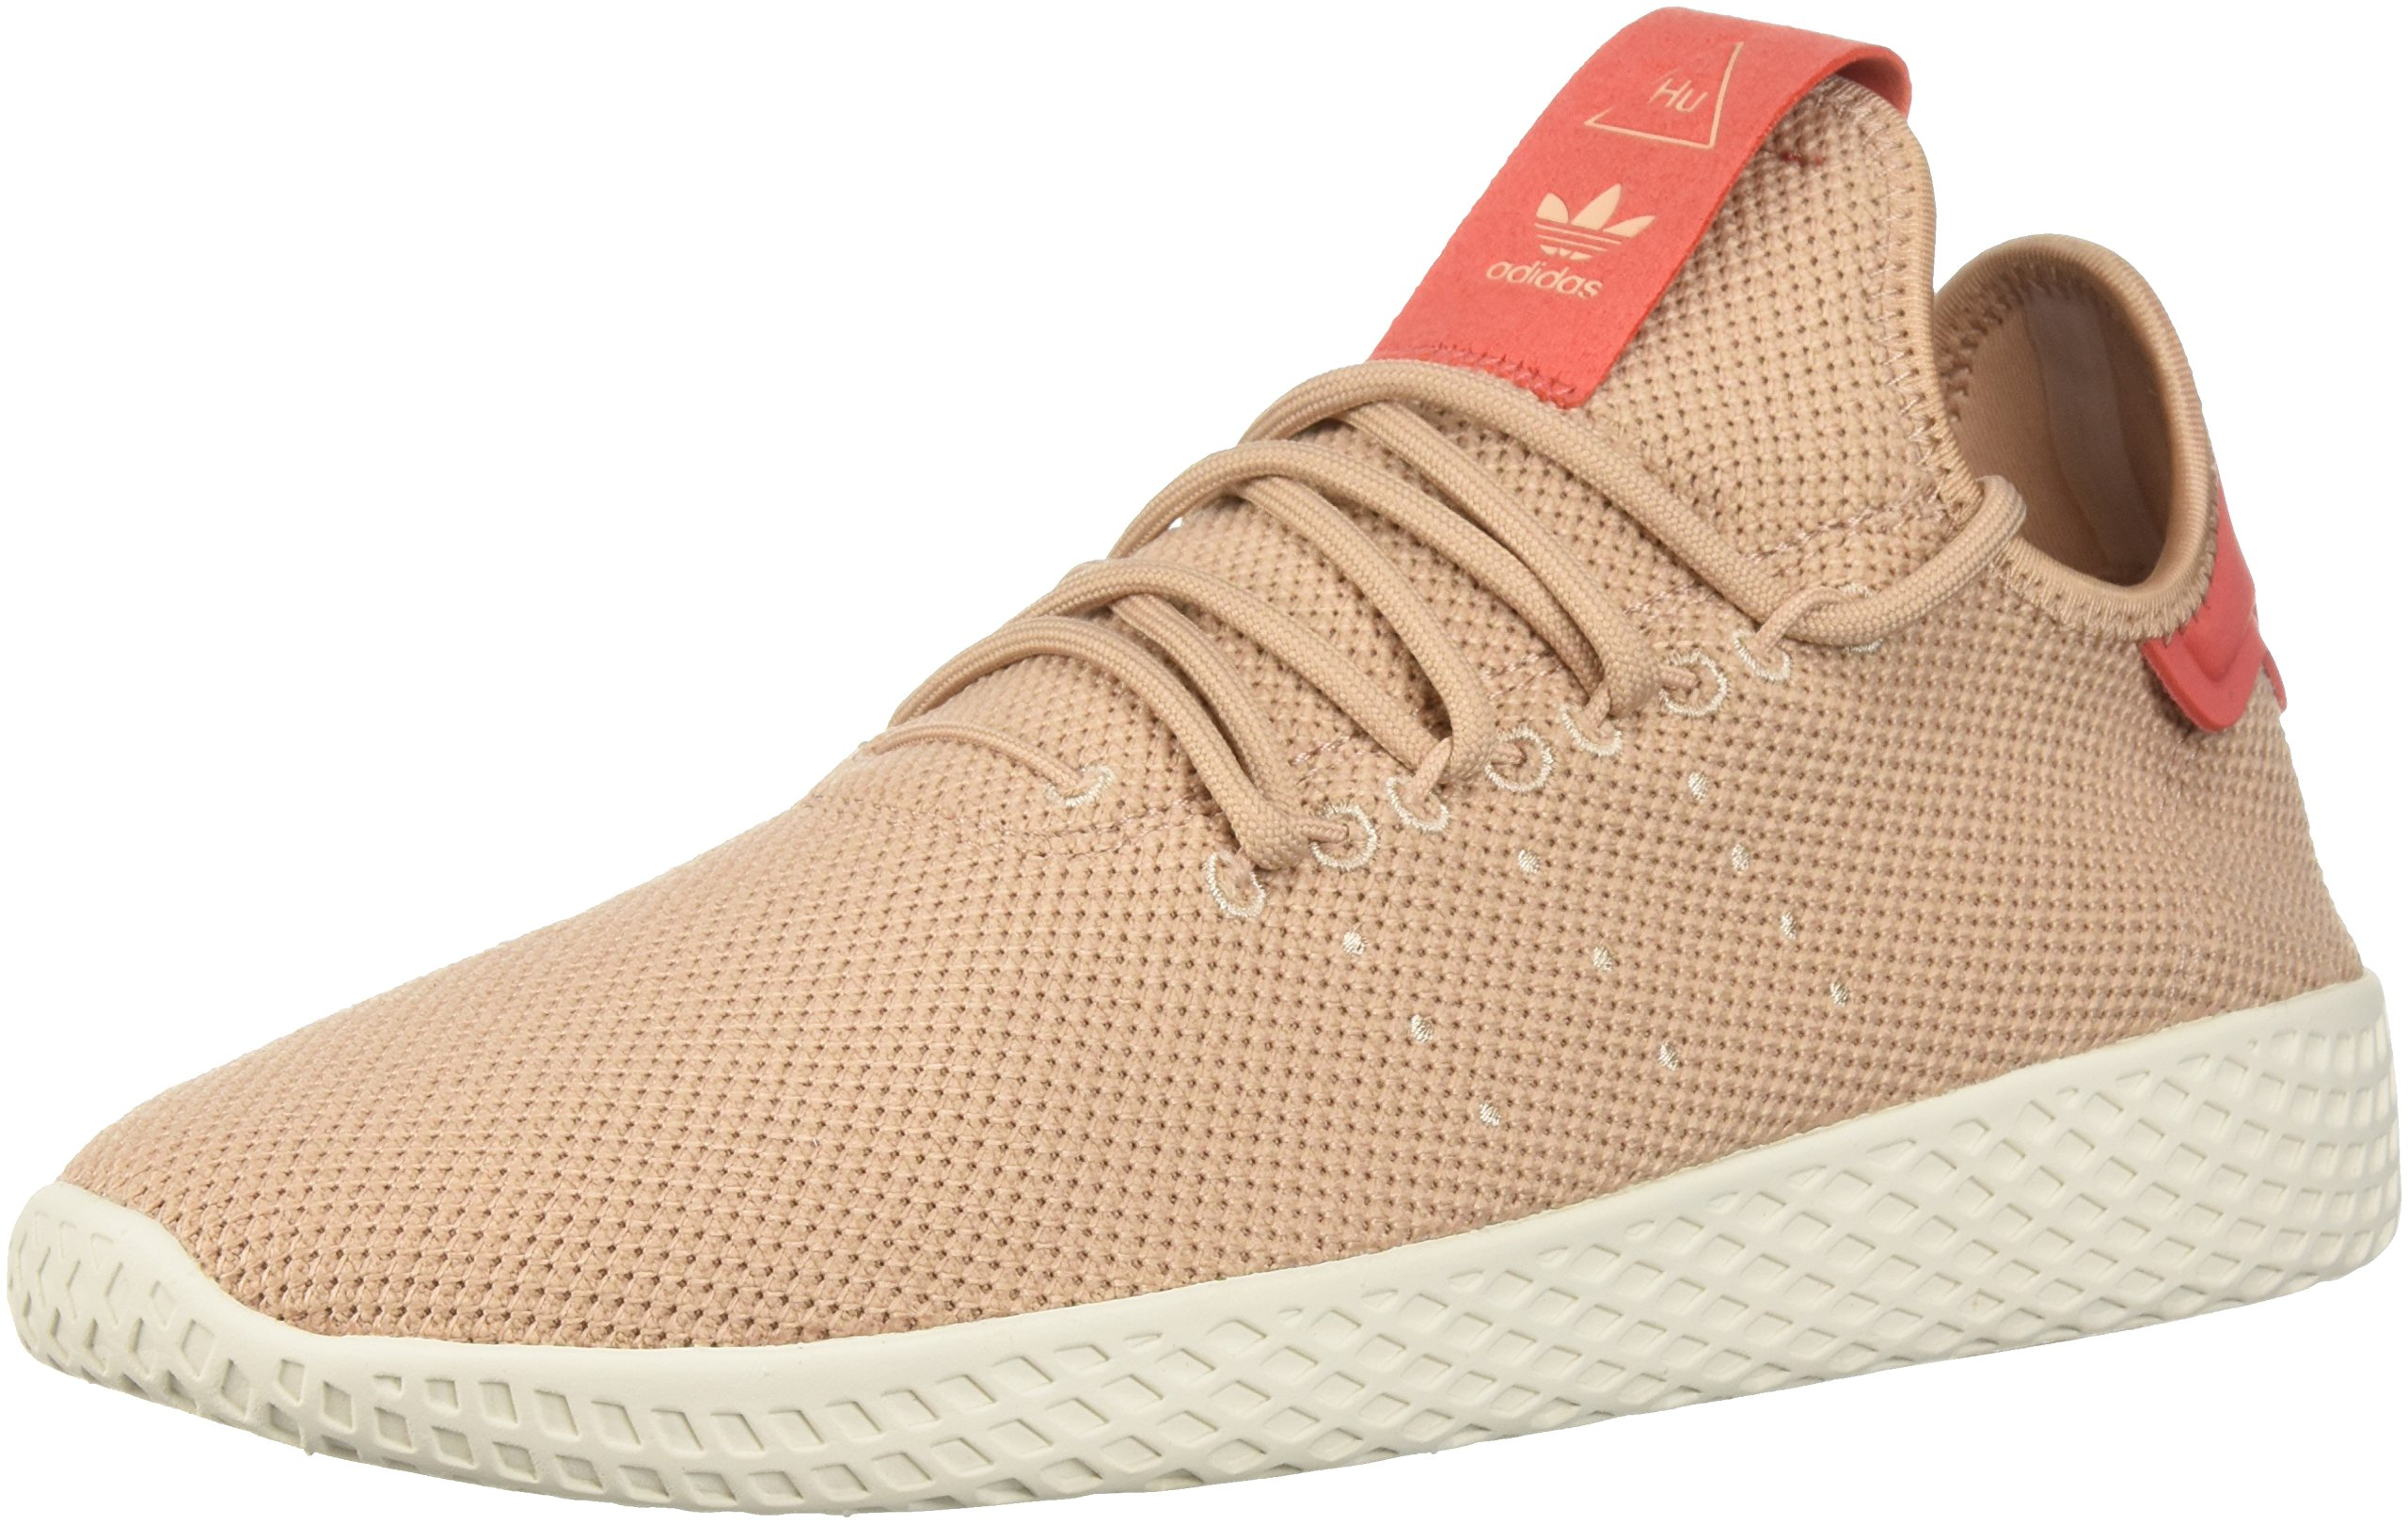 Adidas Kids' Pw Hu C Tennis Shoe,Carbon/Carbon/Chalk White,8 Medium US